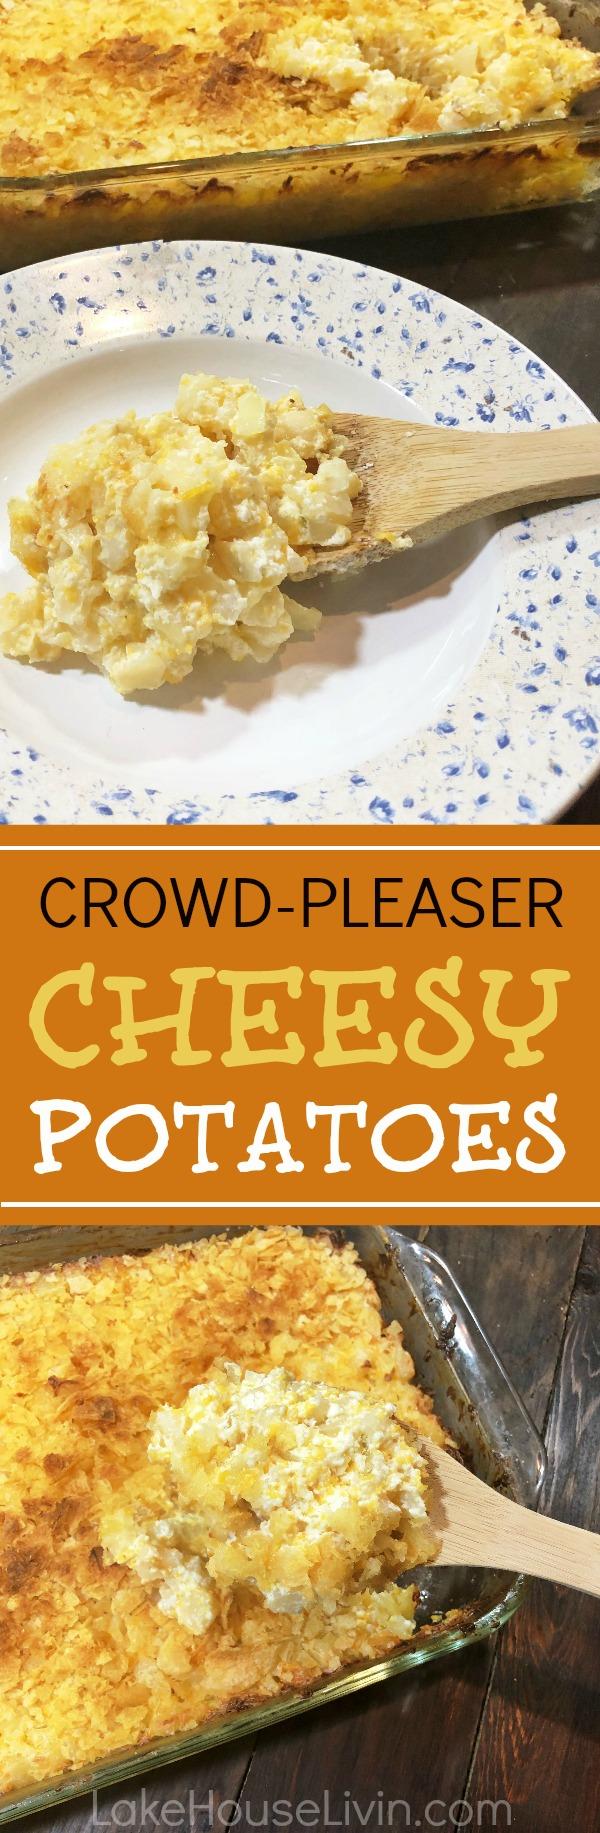 cheesy potatoes, entertaining at the lake, crowd pleaser cheesy potatoes, entertaining side dish, lake house recipes